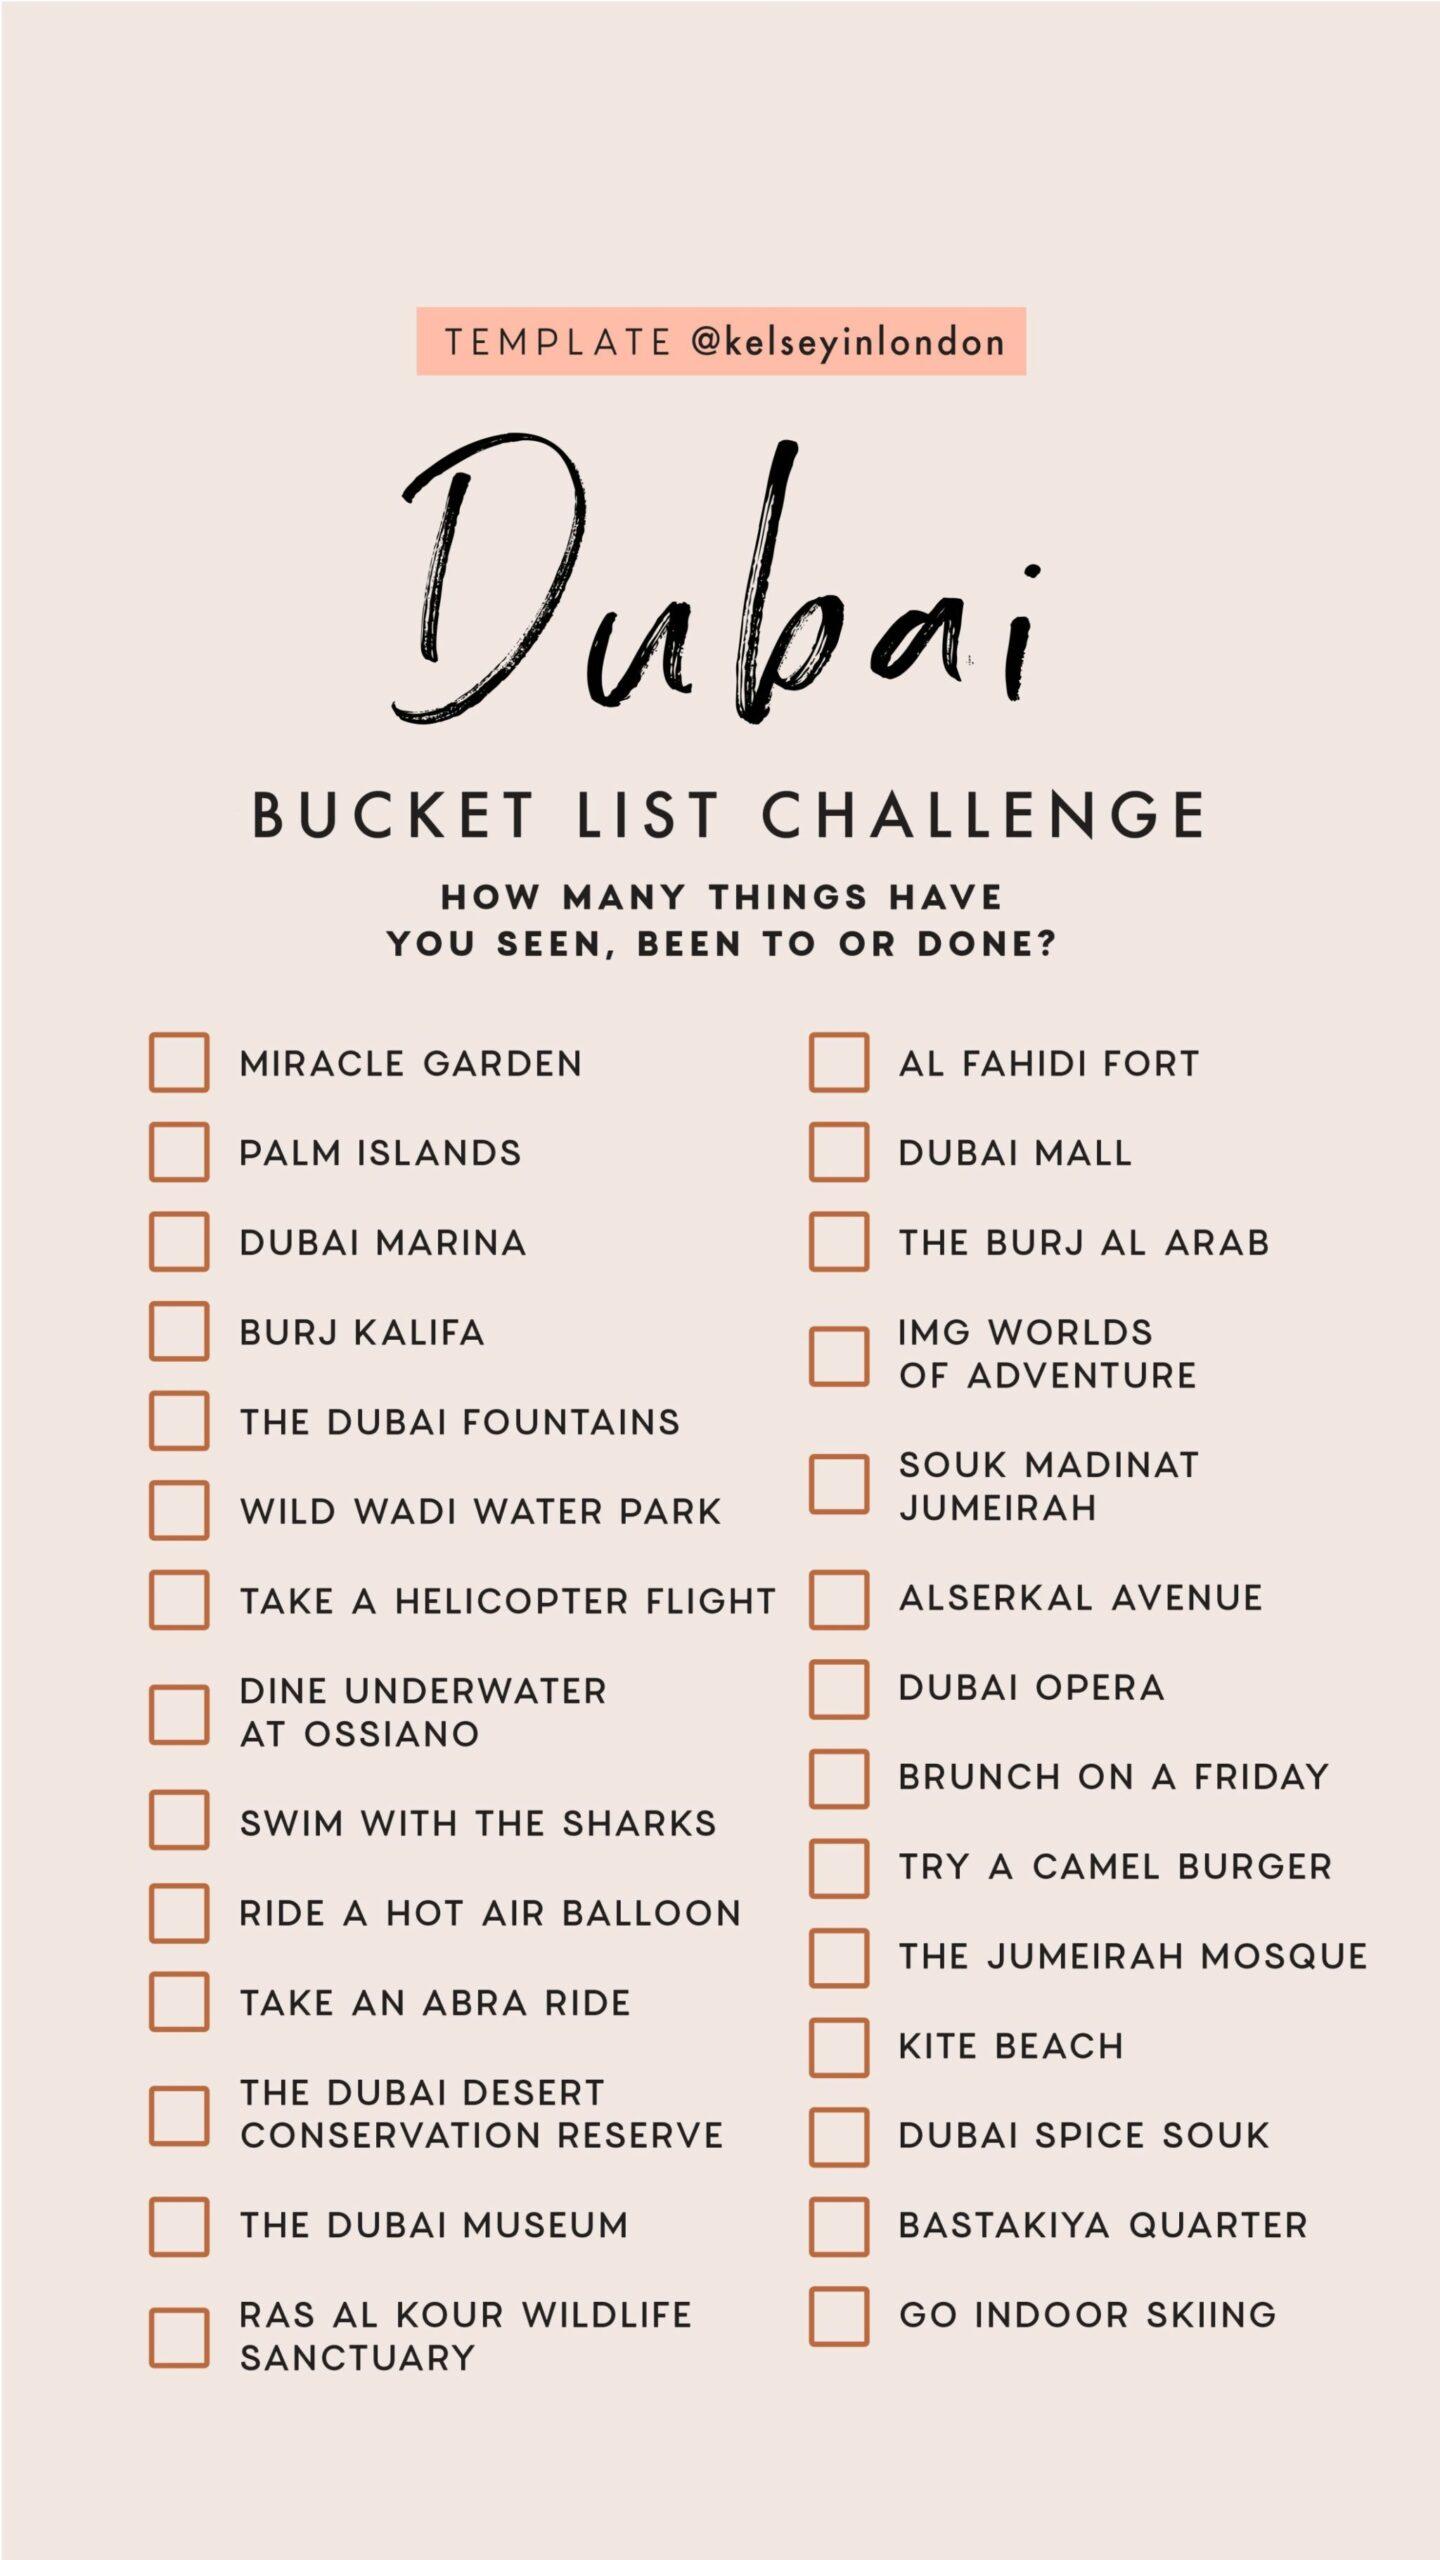 instagram-template-dubai_bucketlist_kelseyheinrichs_kelseyinlondon_top_places_to_go_in_dubai-top-things-to-do-in-dubai.jpg